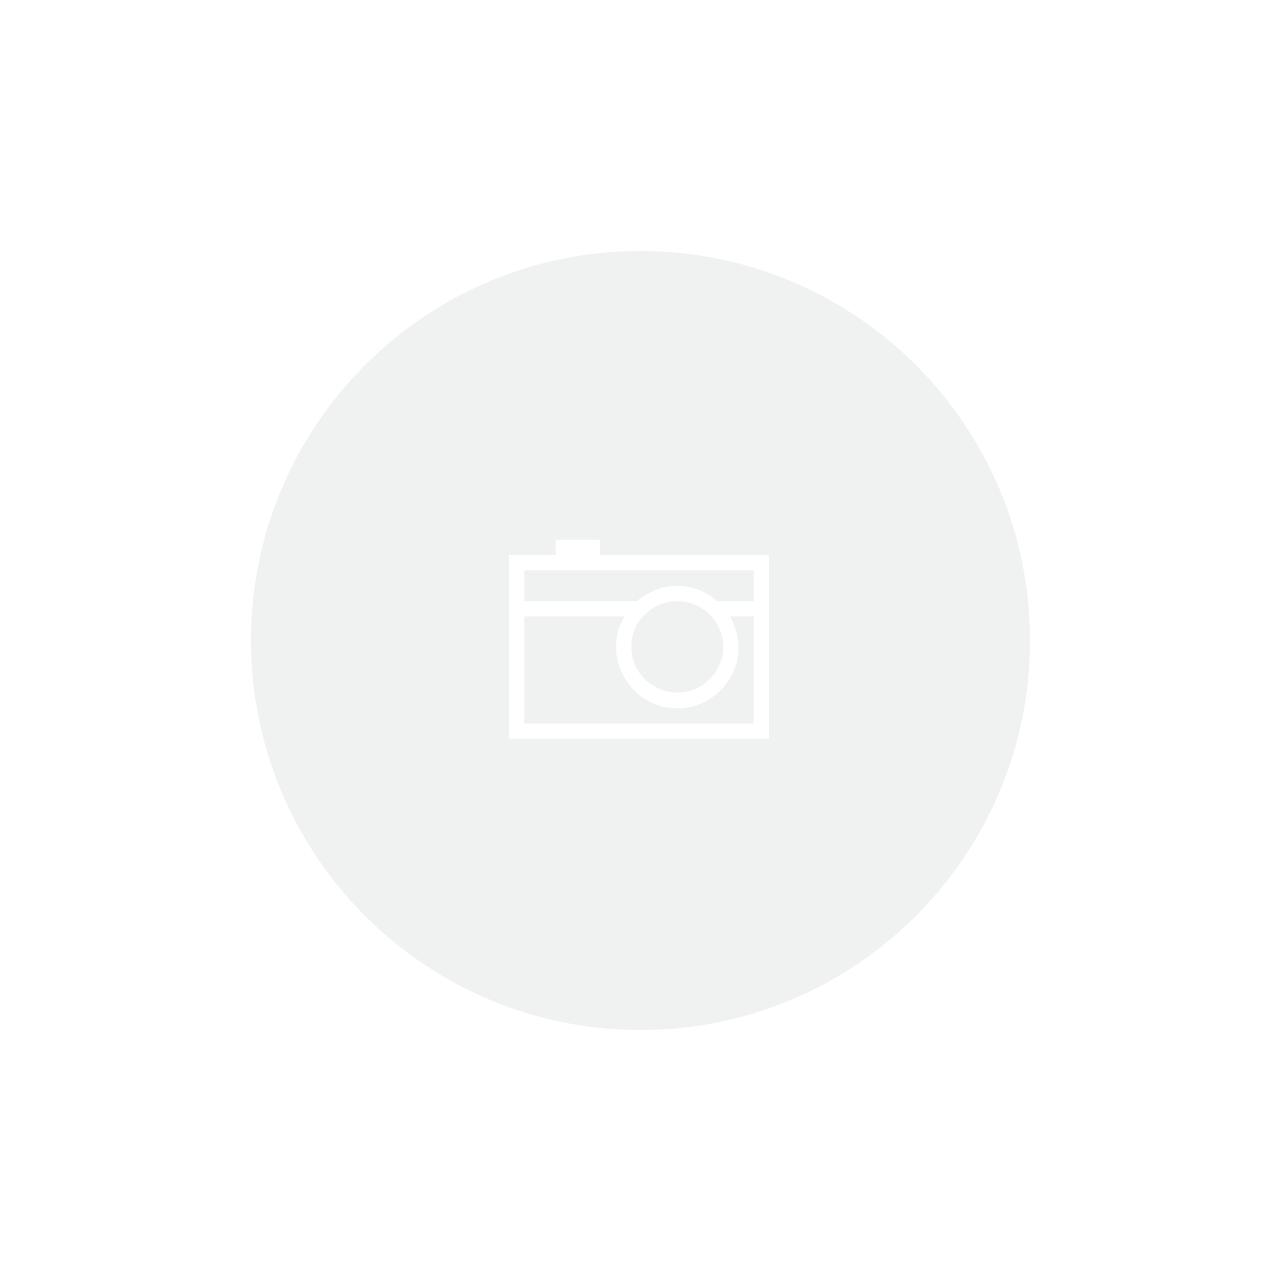 GPS GARMIN EDGE 130 PLUS BUNDLE C/ MONITOR E CINTA CARDIACA   Pedalokos  Bike Shop